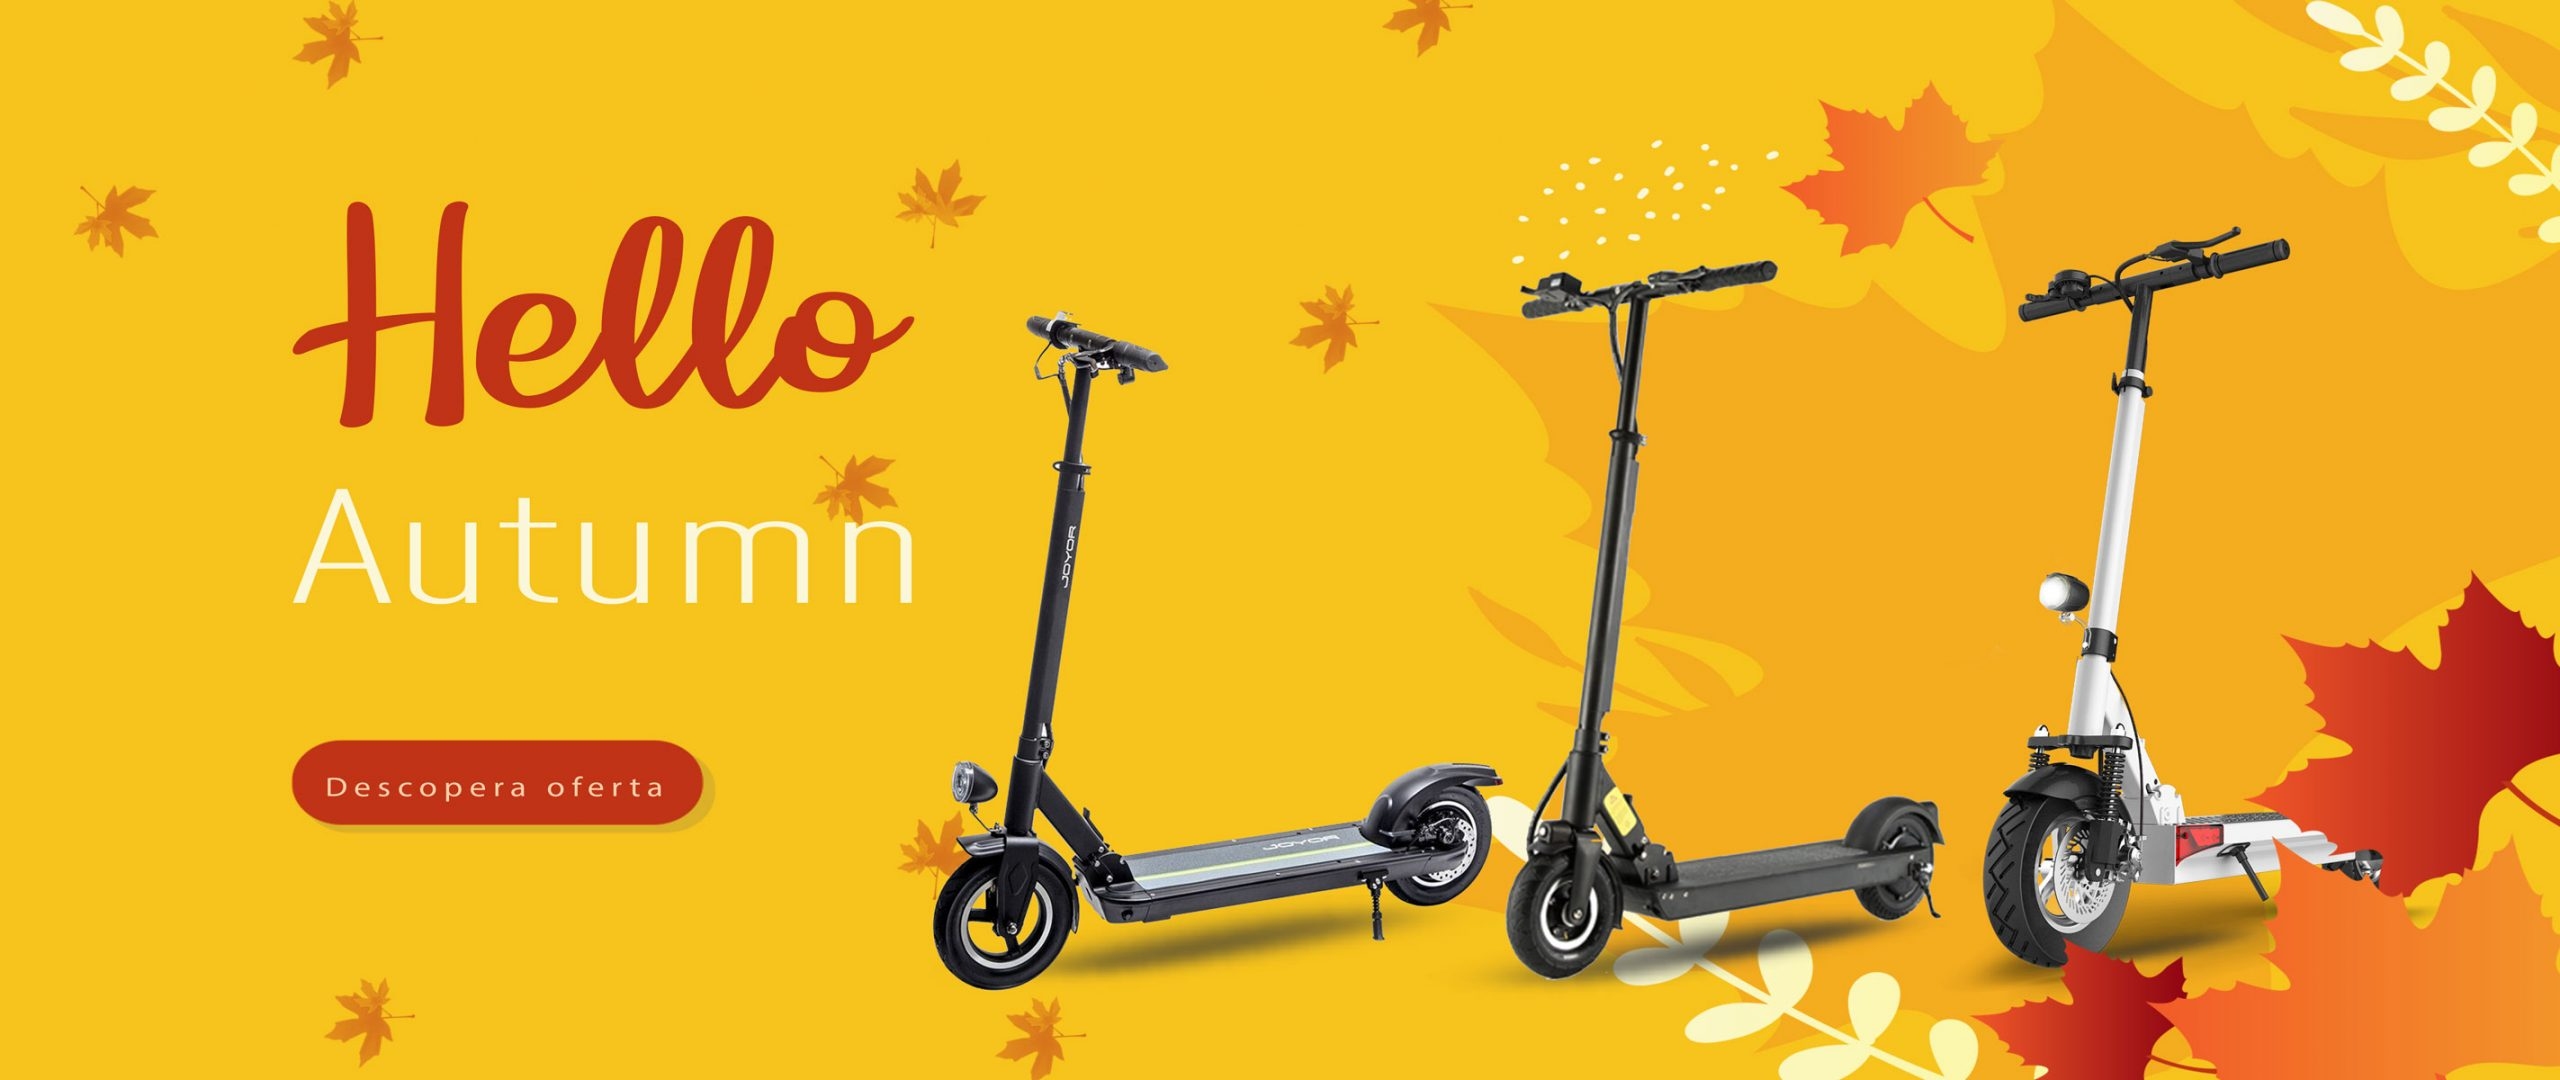 Autumn_fall_2021-Joyor-main